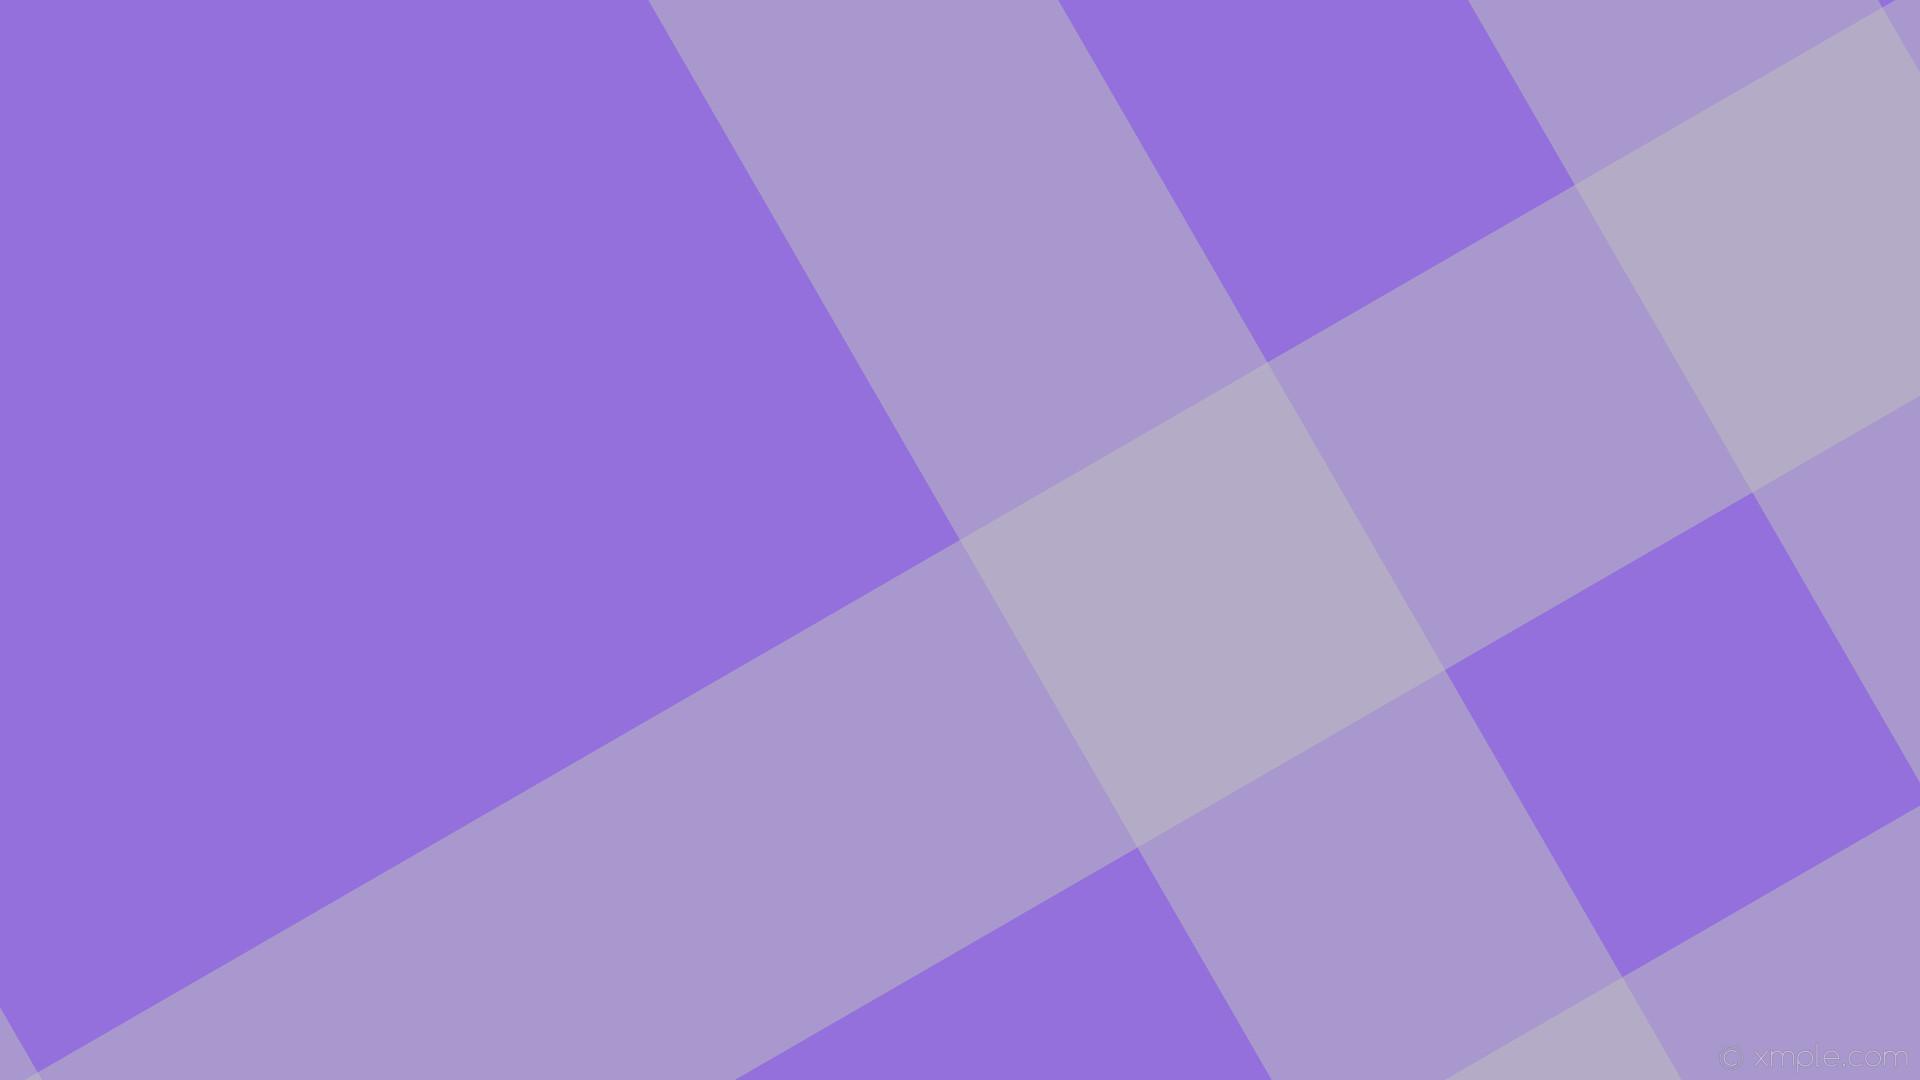 wallpaper grey dual striped gingham purple medium purple silver #9370db  #c0c0c0 30° 355px